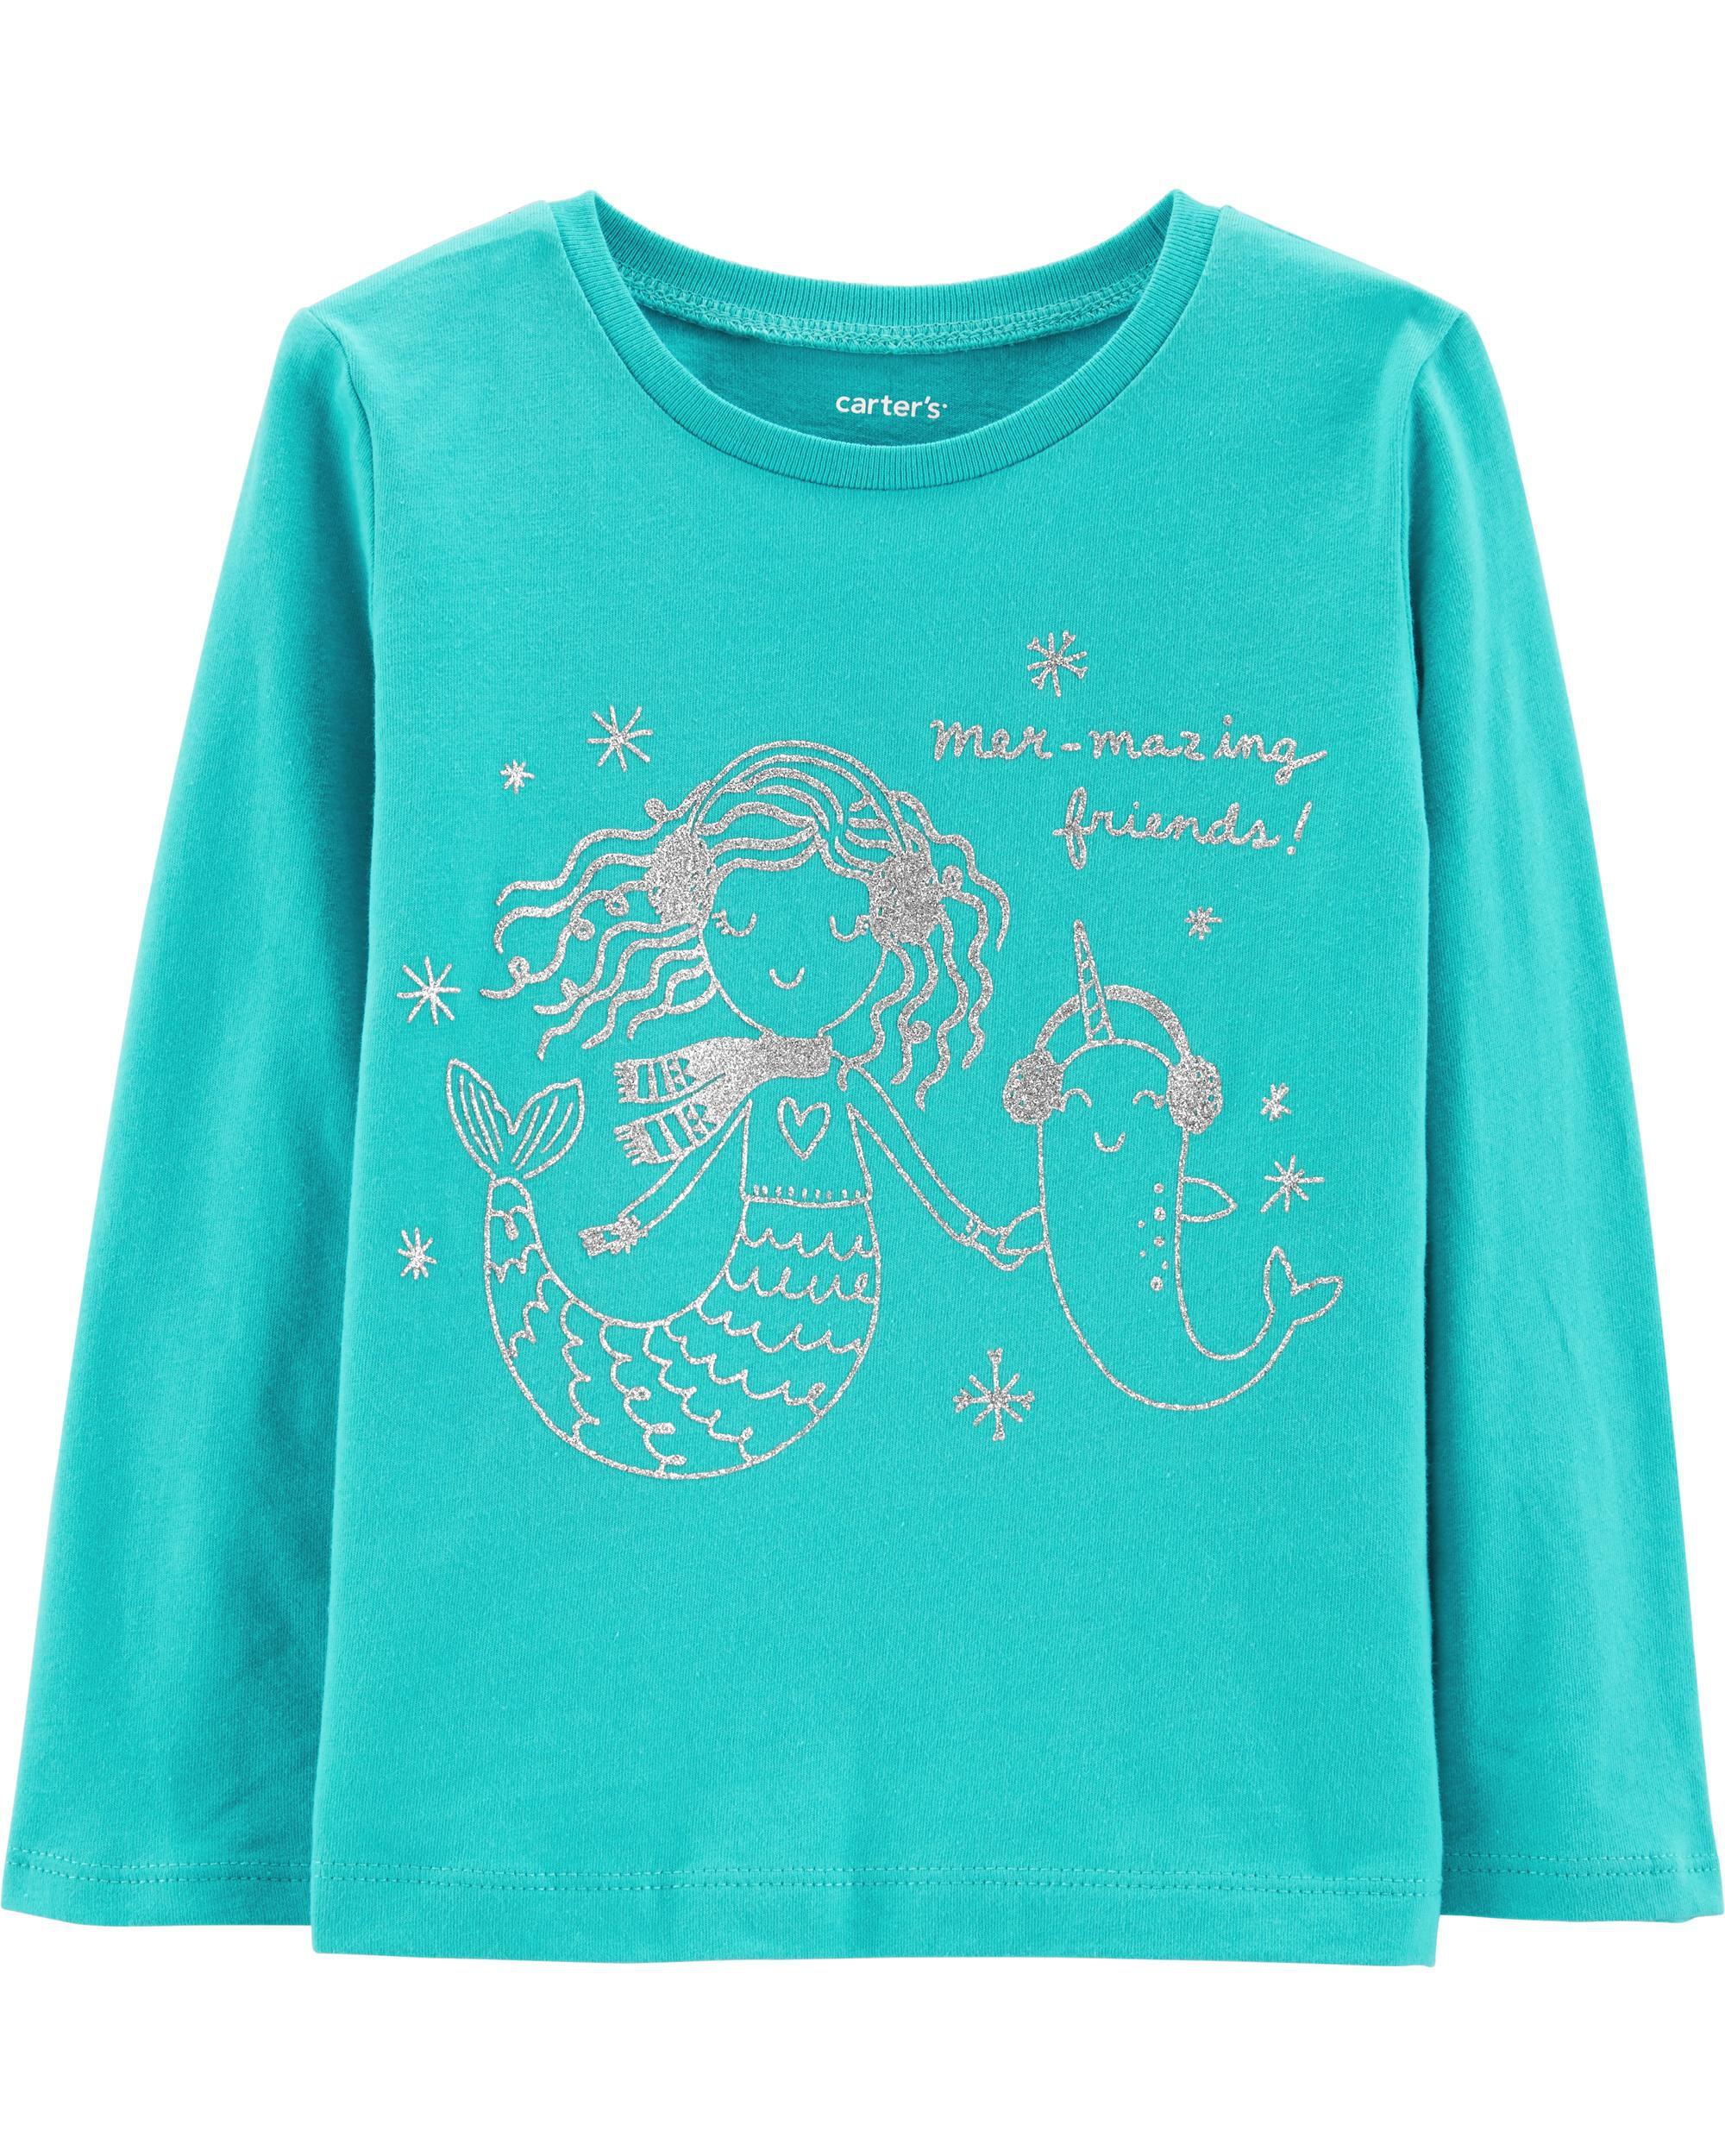 *Clearance*  Mermaid Jersey Tee